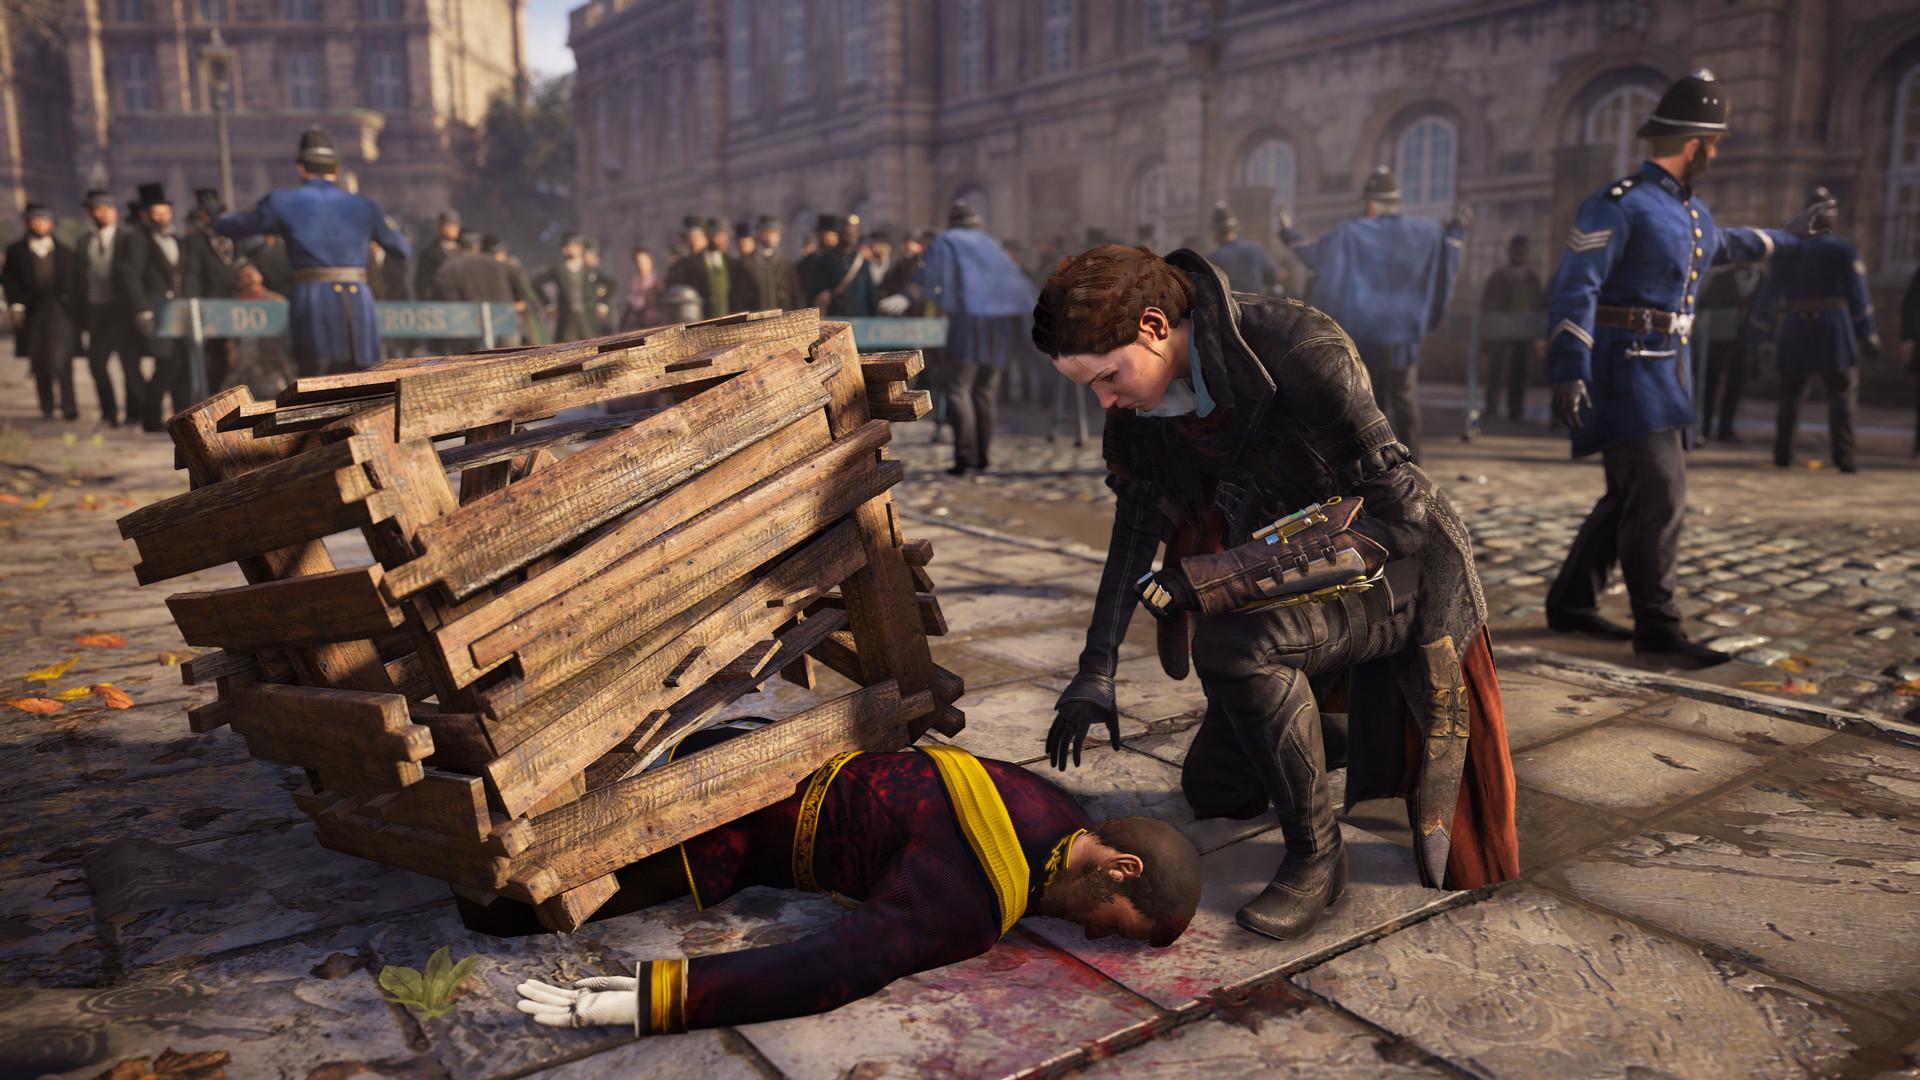 KHAiHOM.com - Assassin's Creed® Syndicate - The Dreadful Crimes